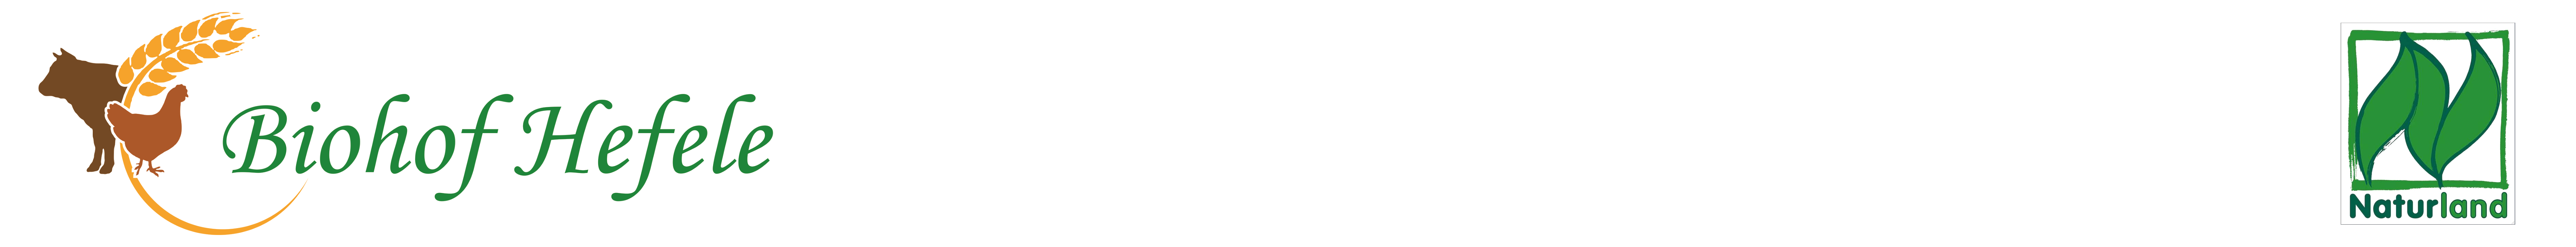 Biohof Hefele